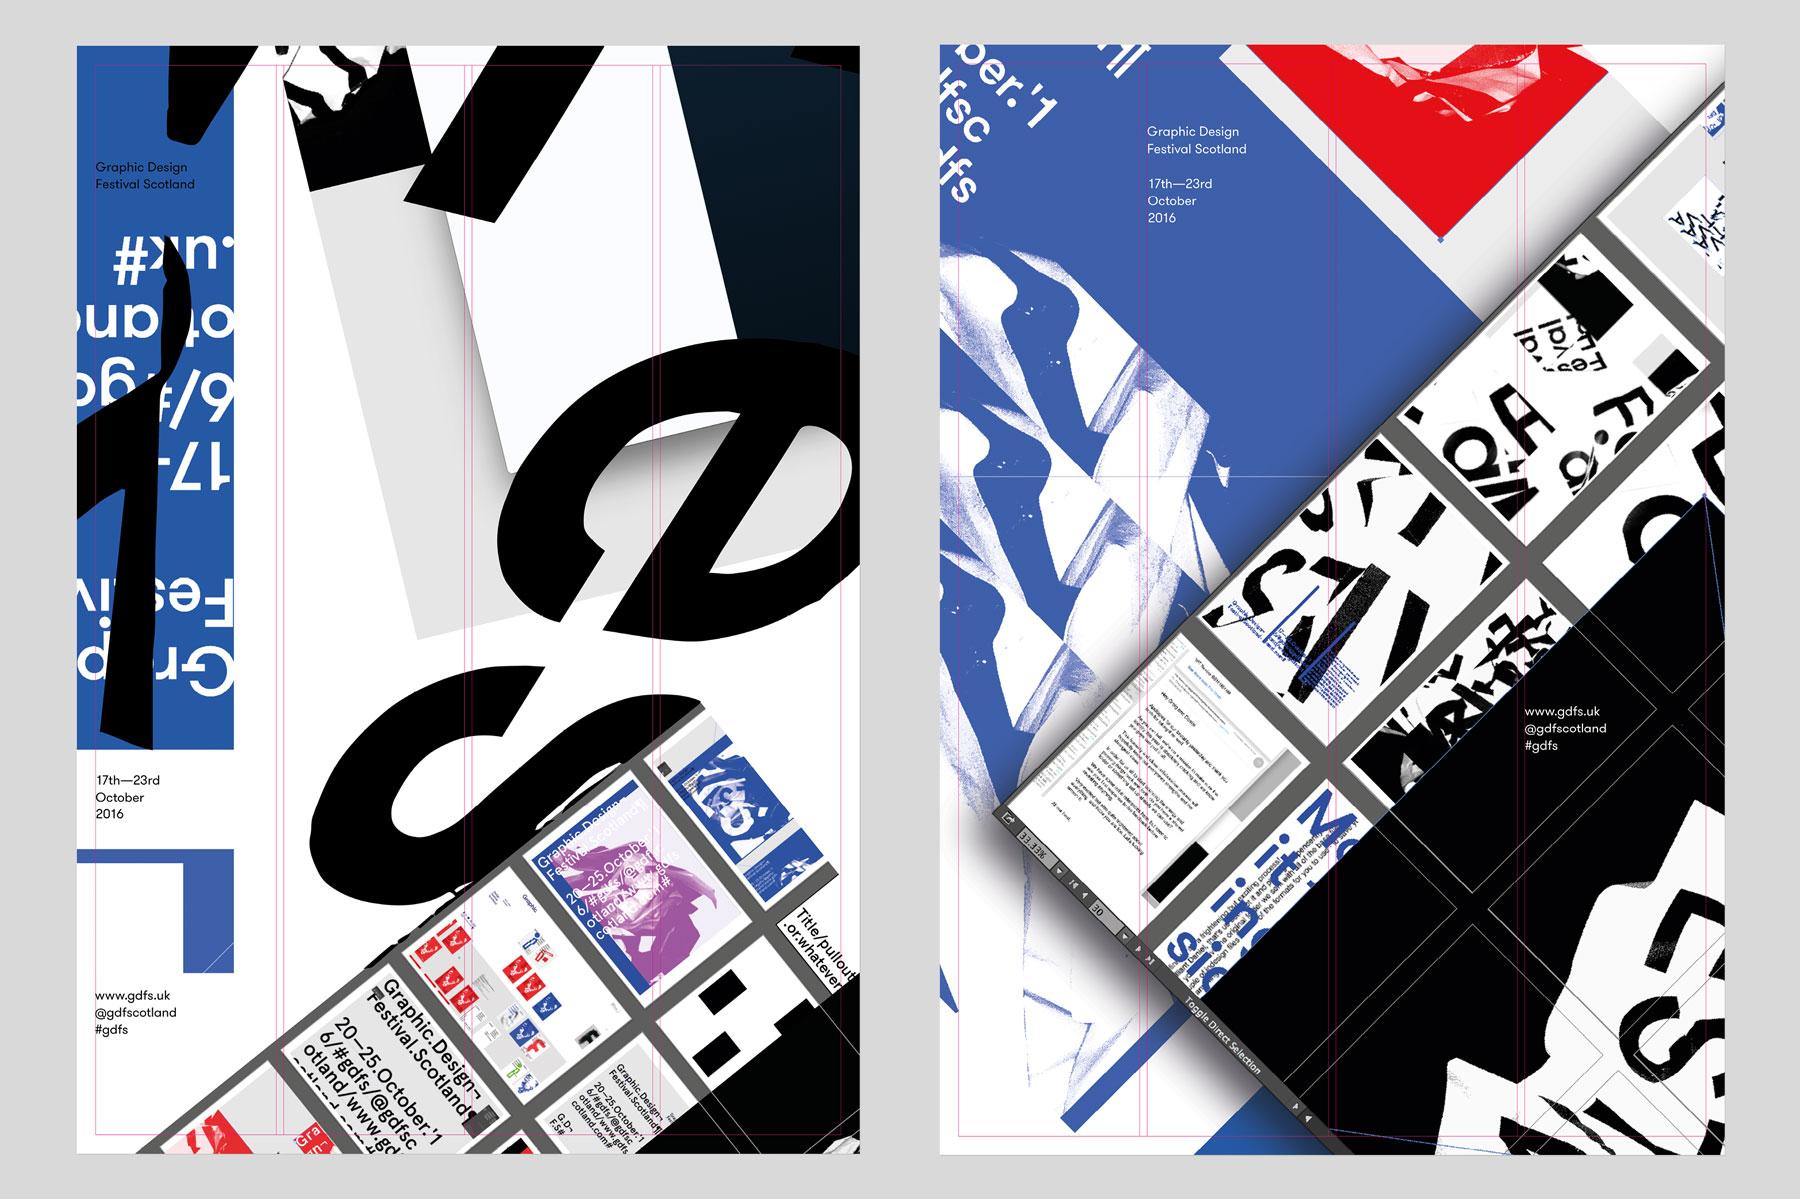 7gdfs-16-custom-identity-posters